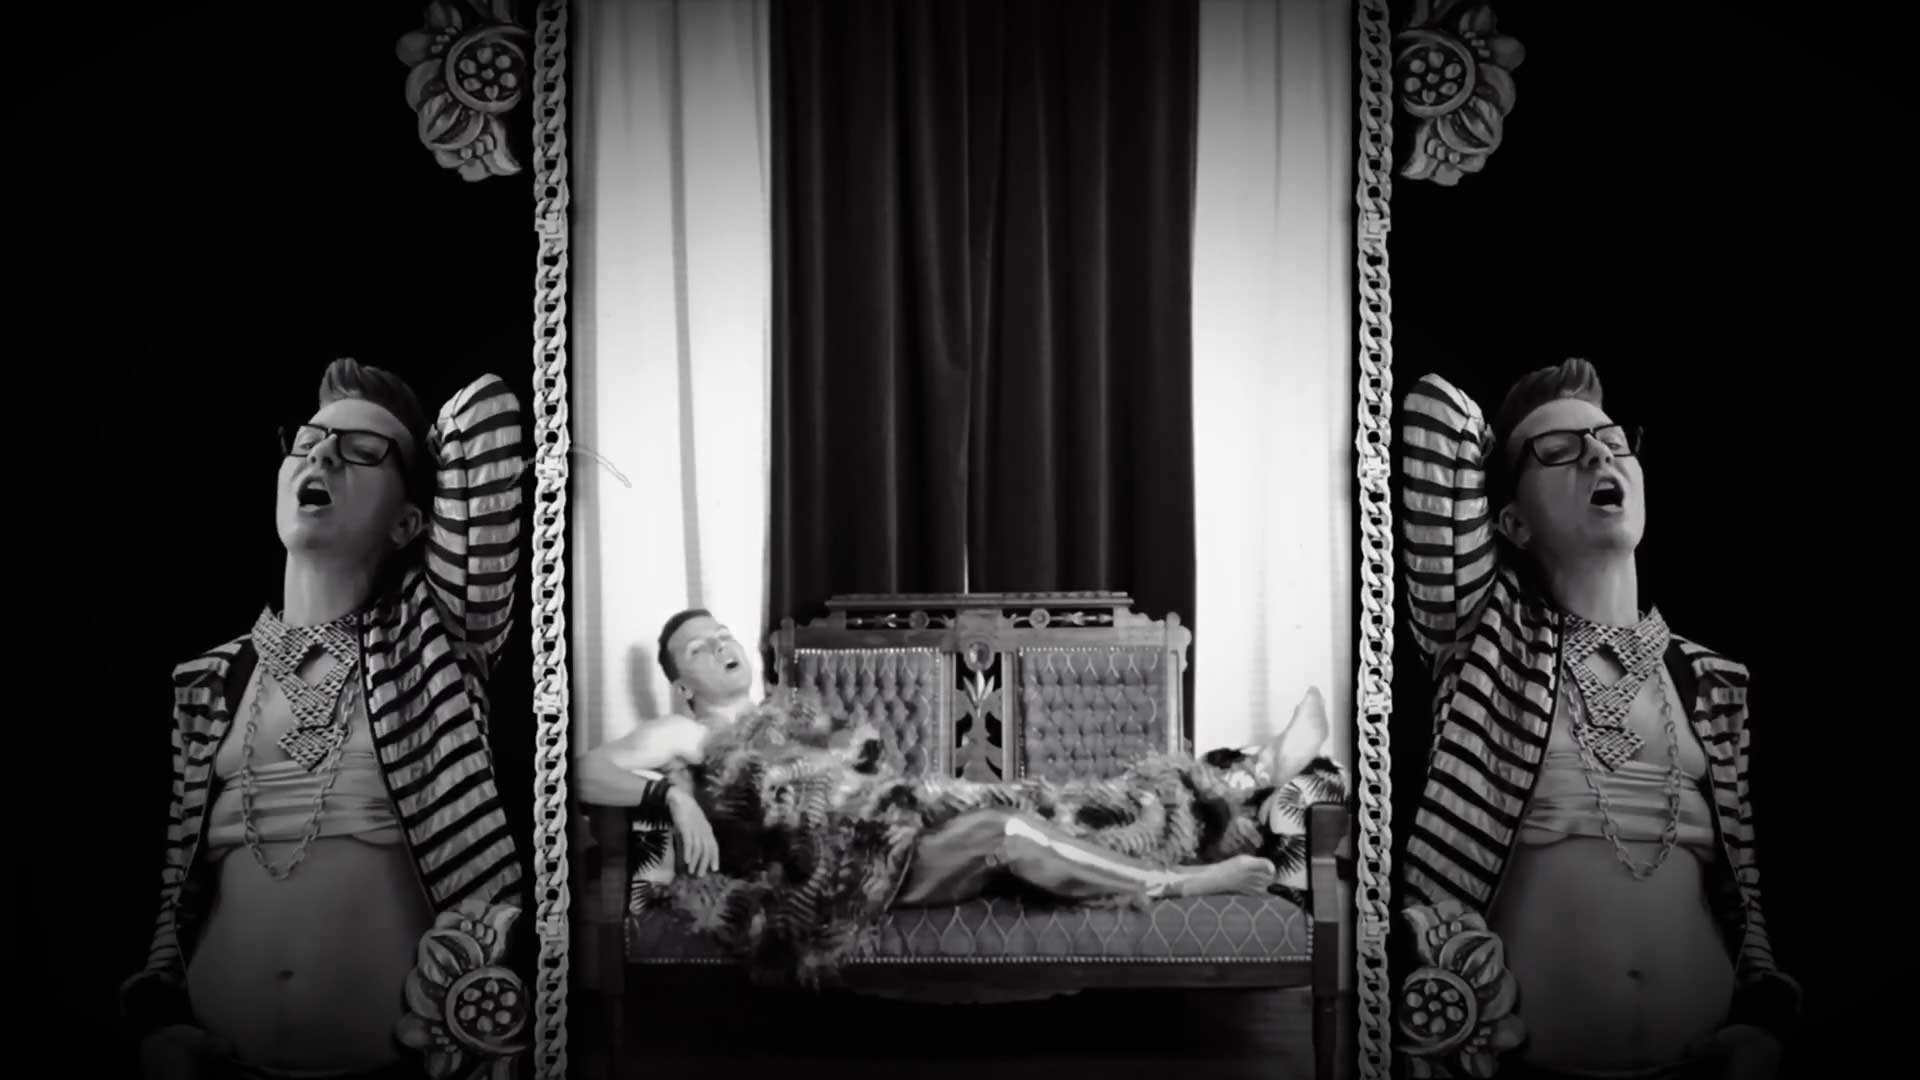 Le Fomo - NOTDF (Nip On The Dance Floor)